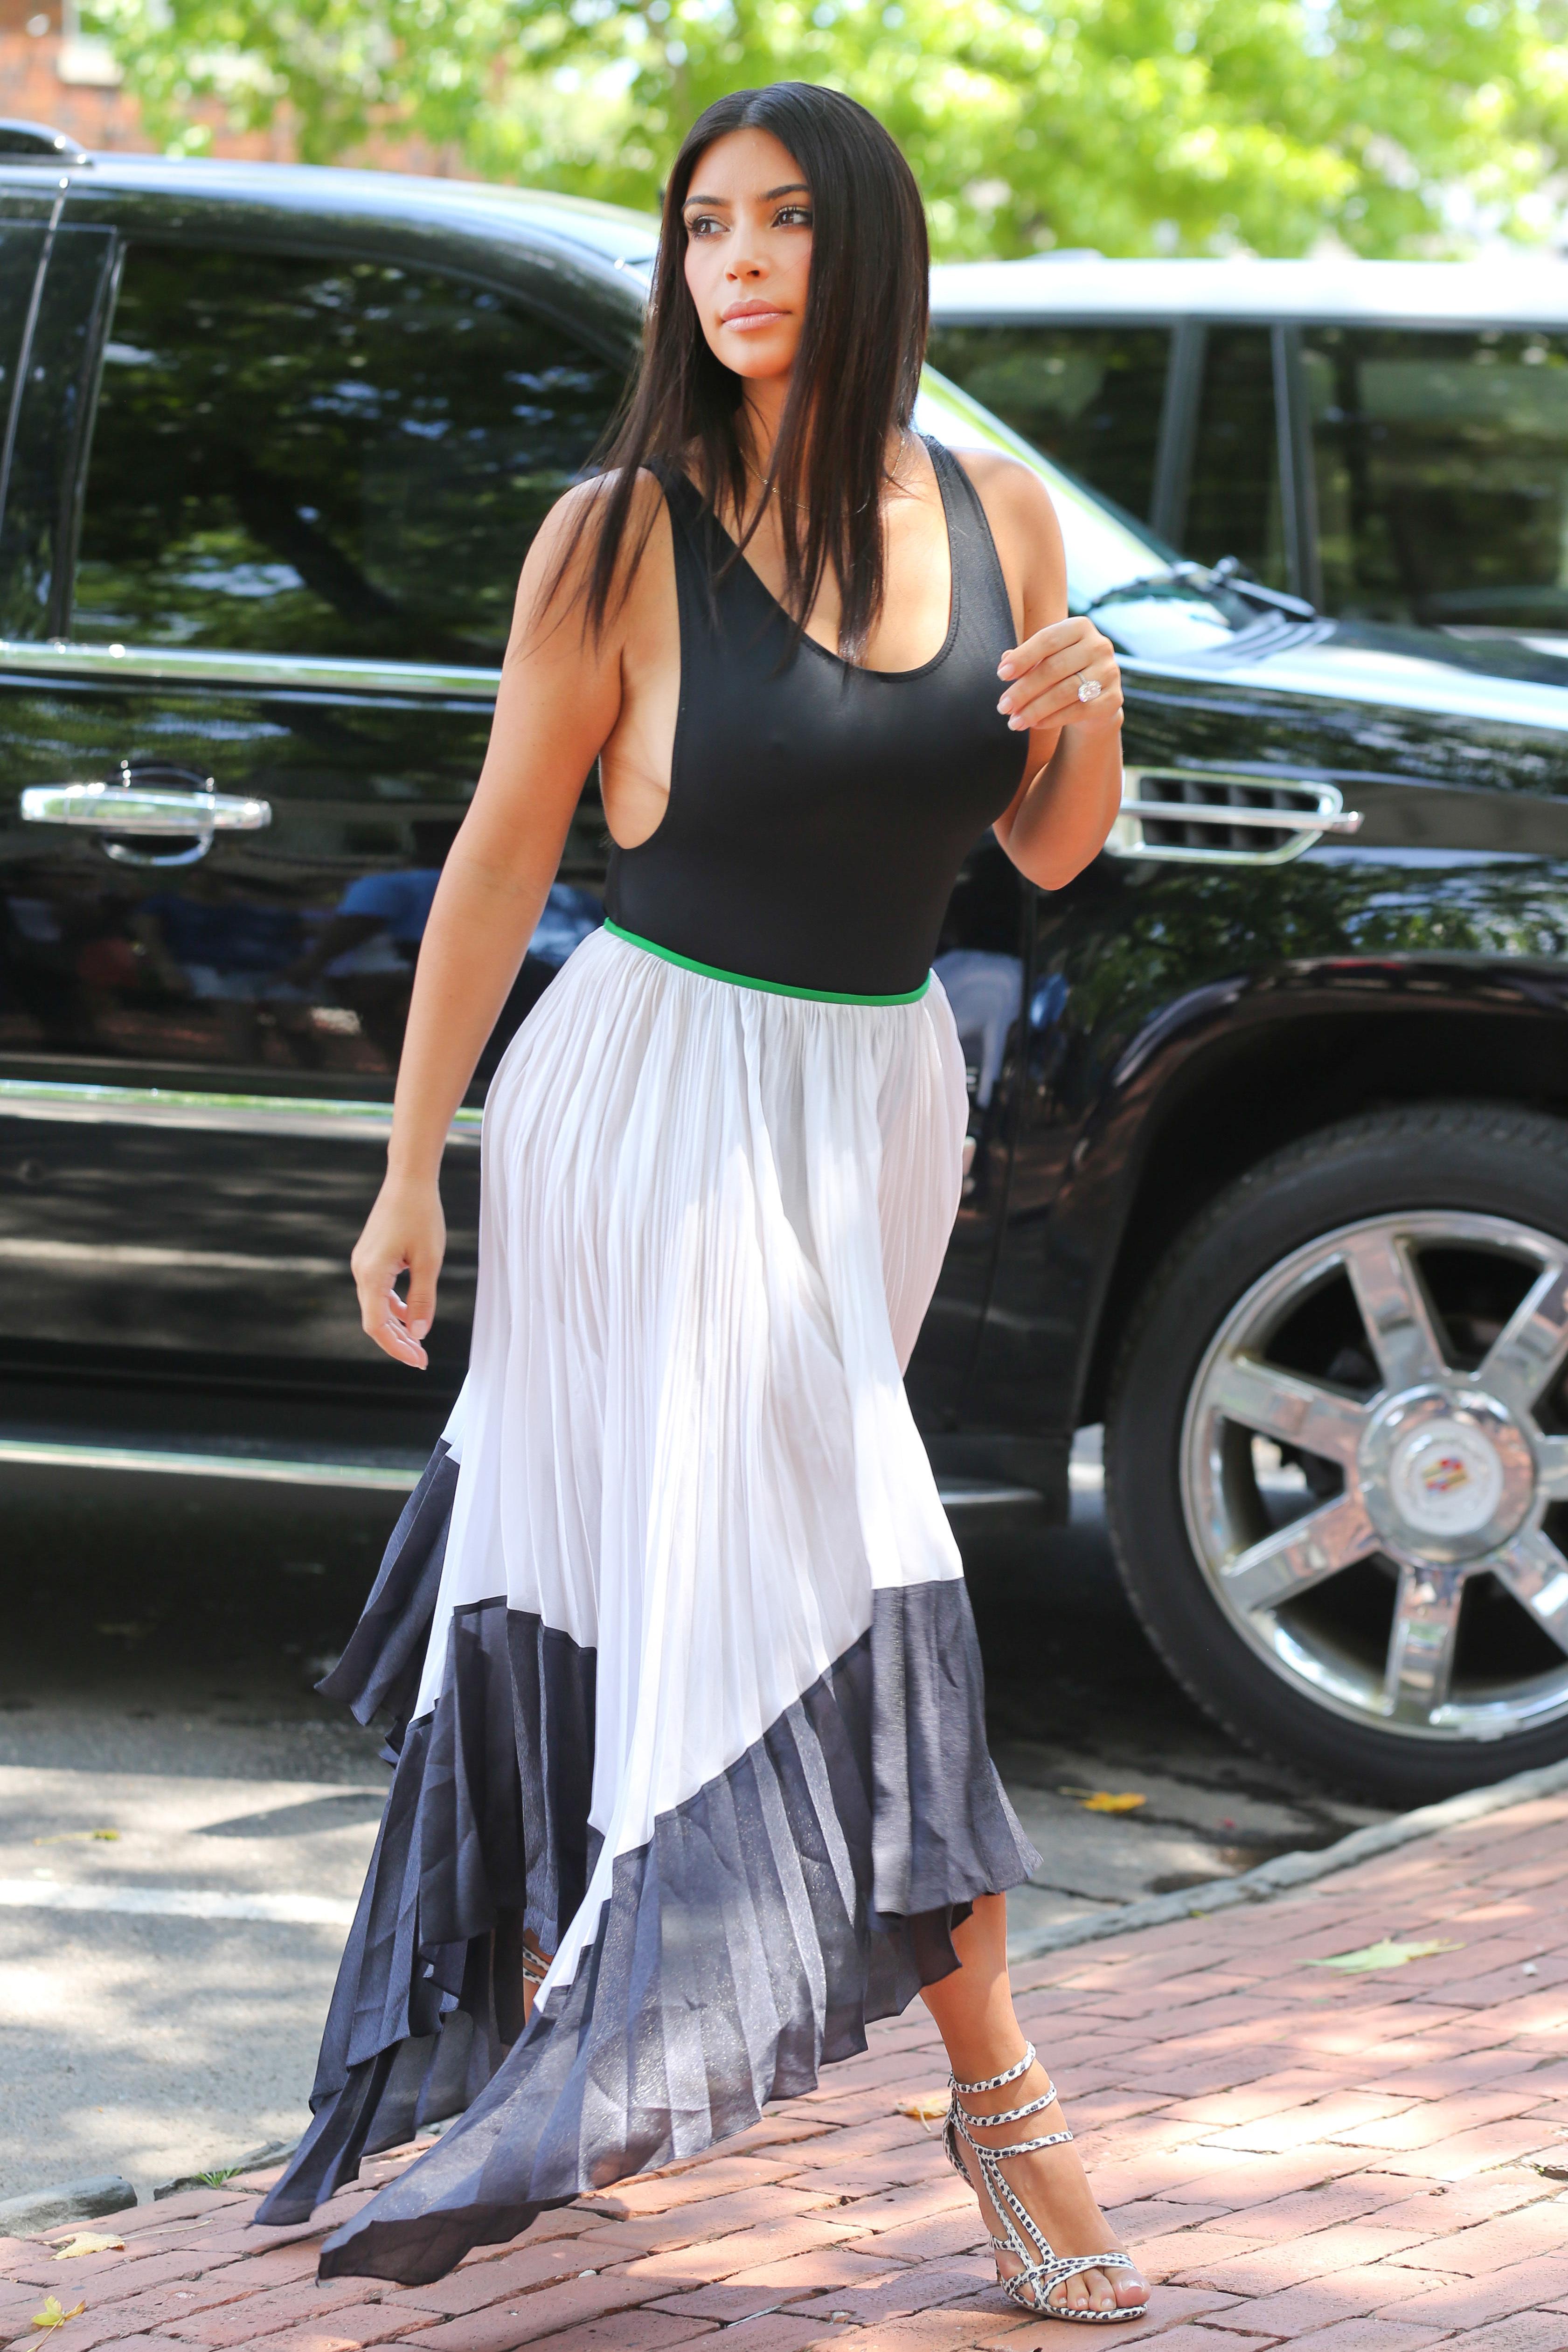 kim kardashian side boob 2